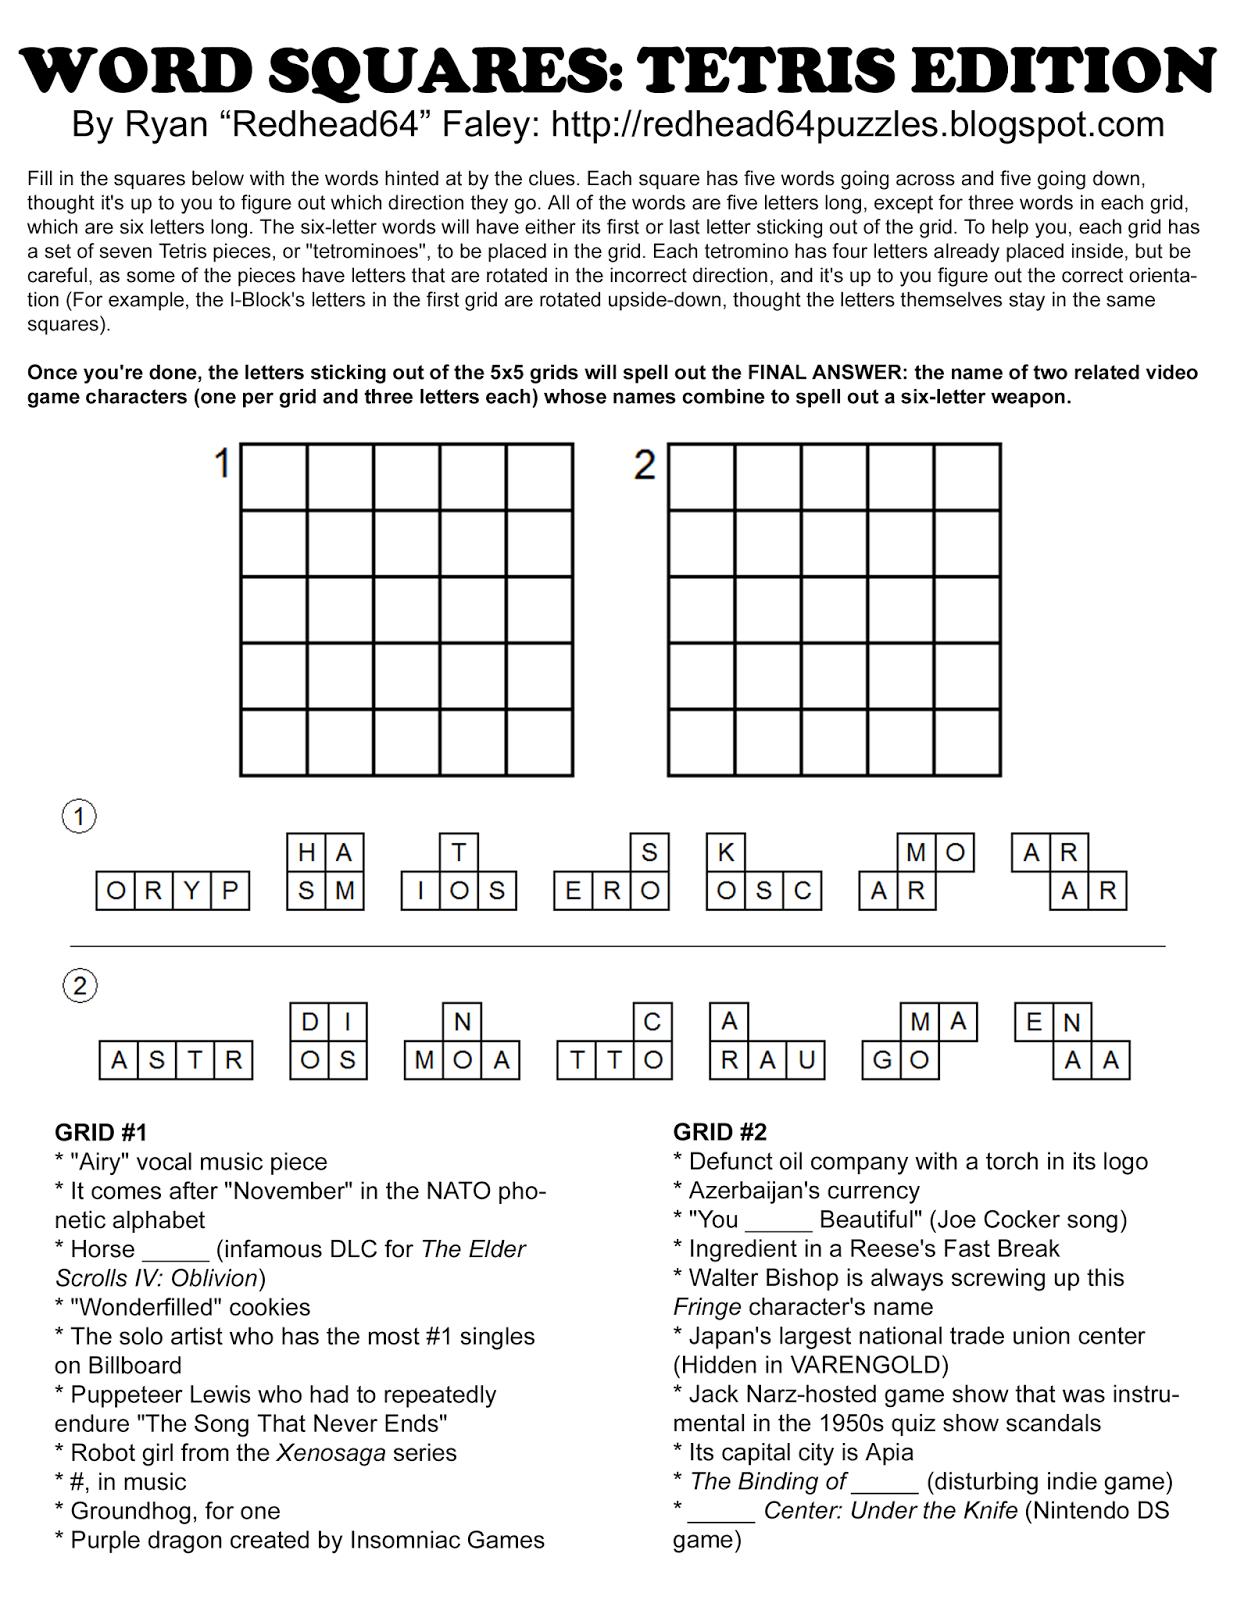 Anagram Magic Square Puzzles Related Keywords & Suggestions - Free Printable Anagram Magic Square Puzzles